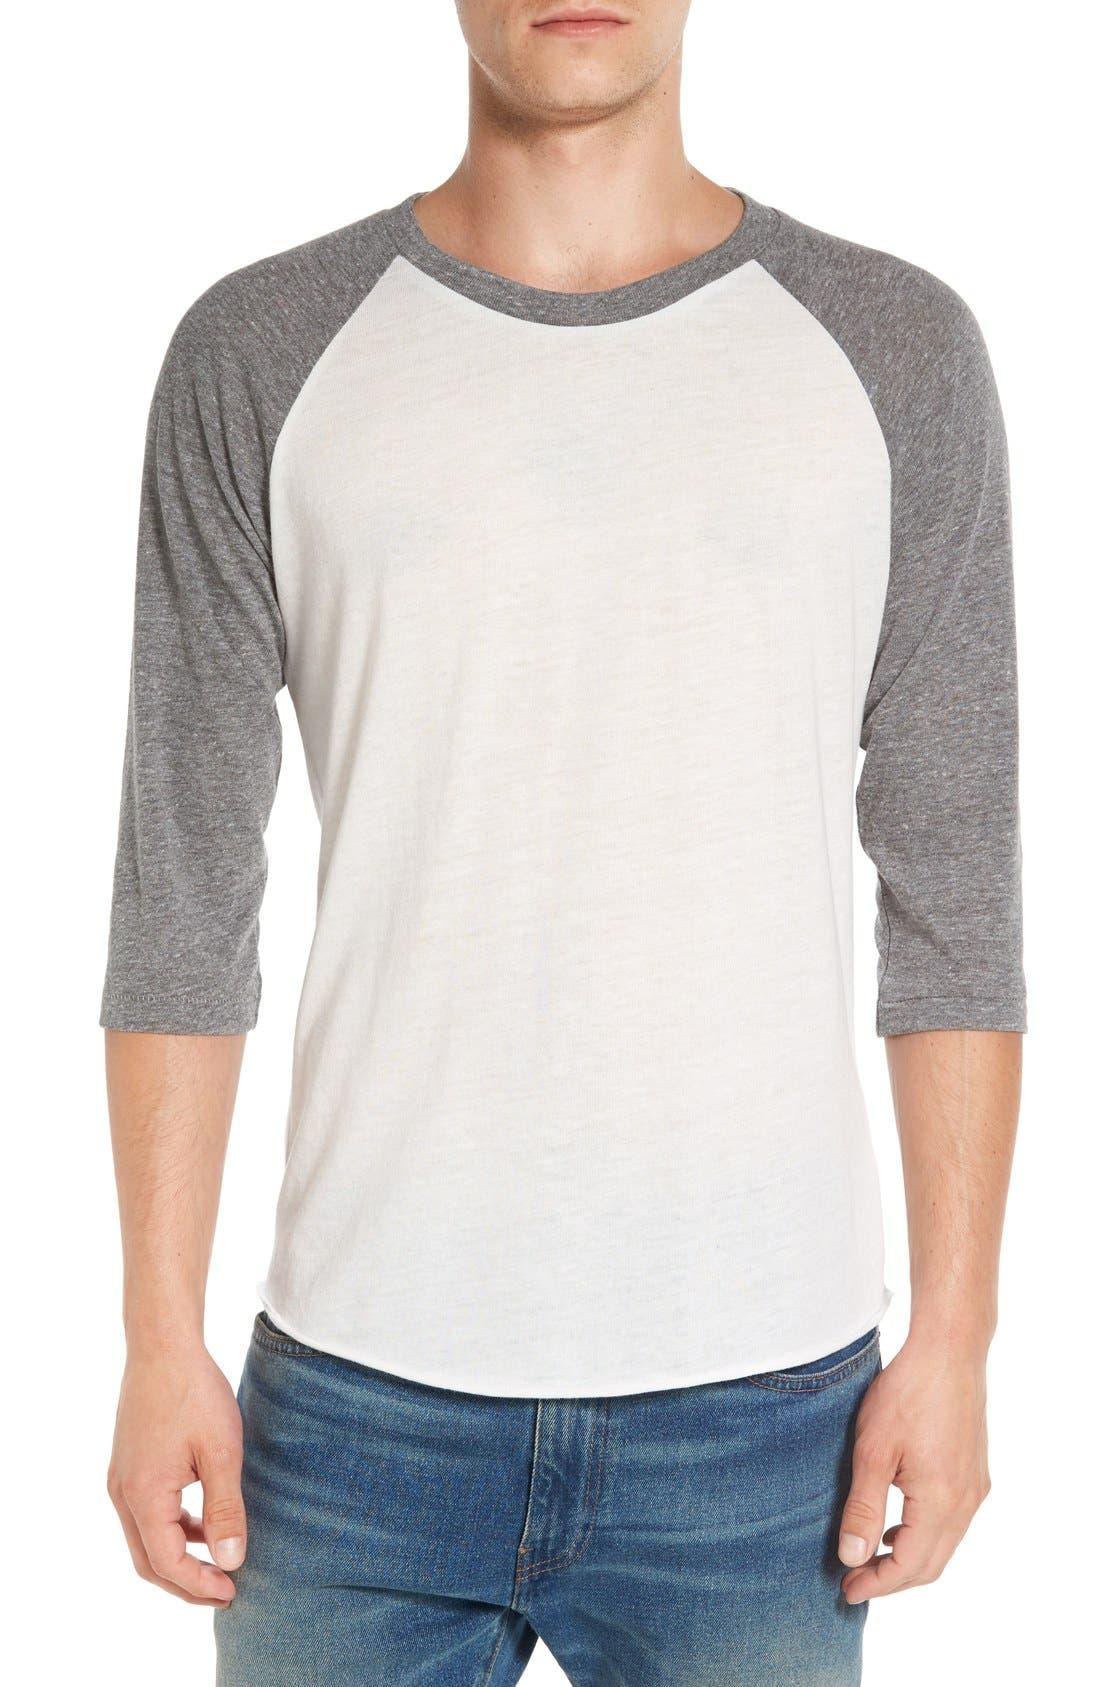 Alternate Image 1 Selected - Alternative Colorblock Baseball T-Shirt